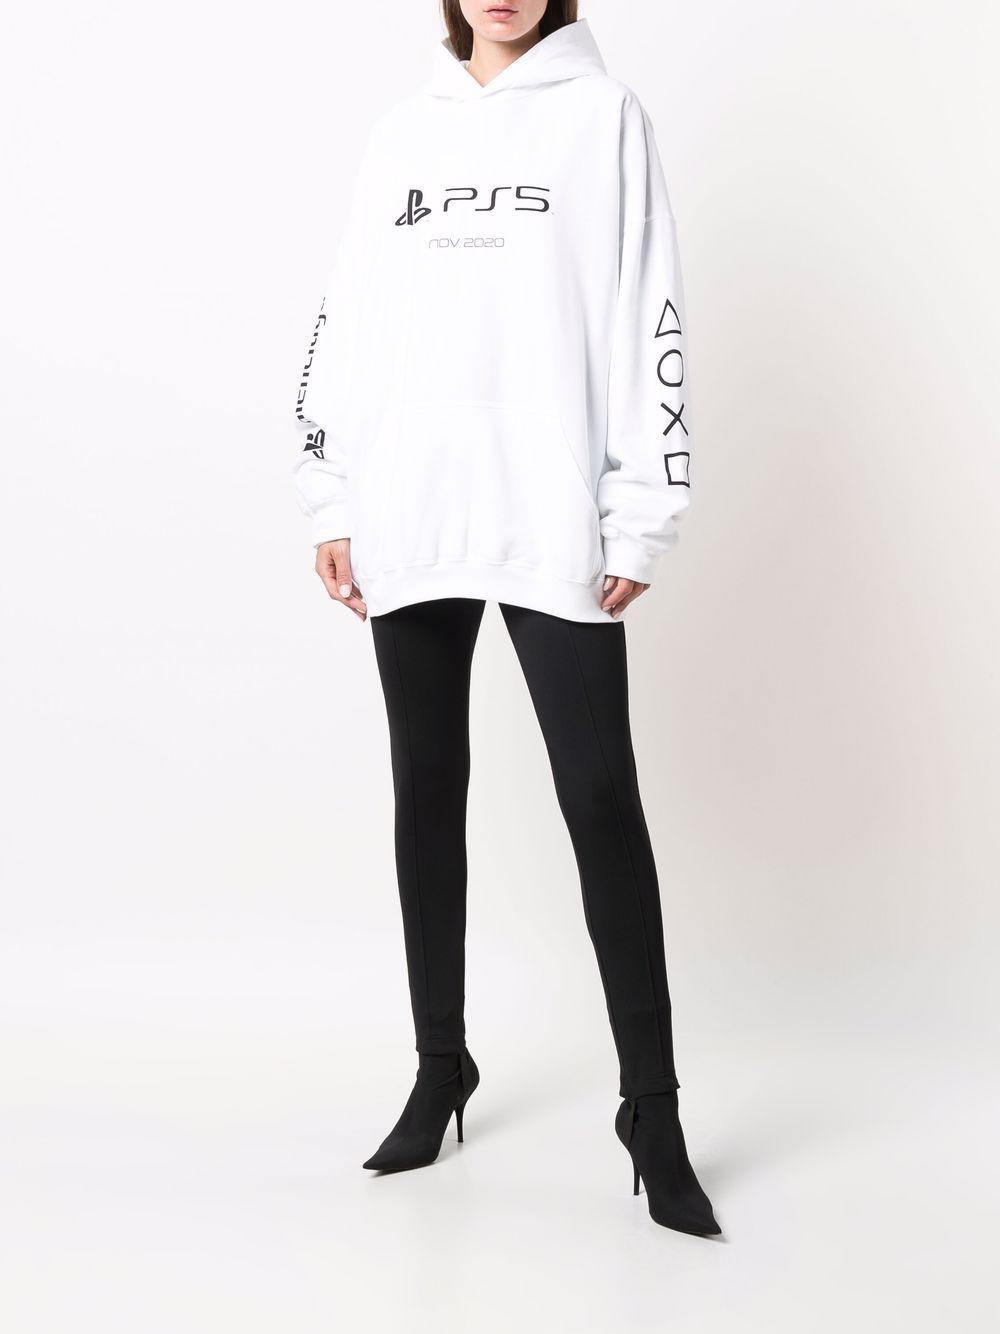 Picture of Balenciaga   Ps5 Sweatshirt